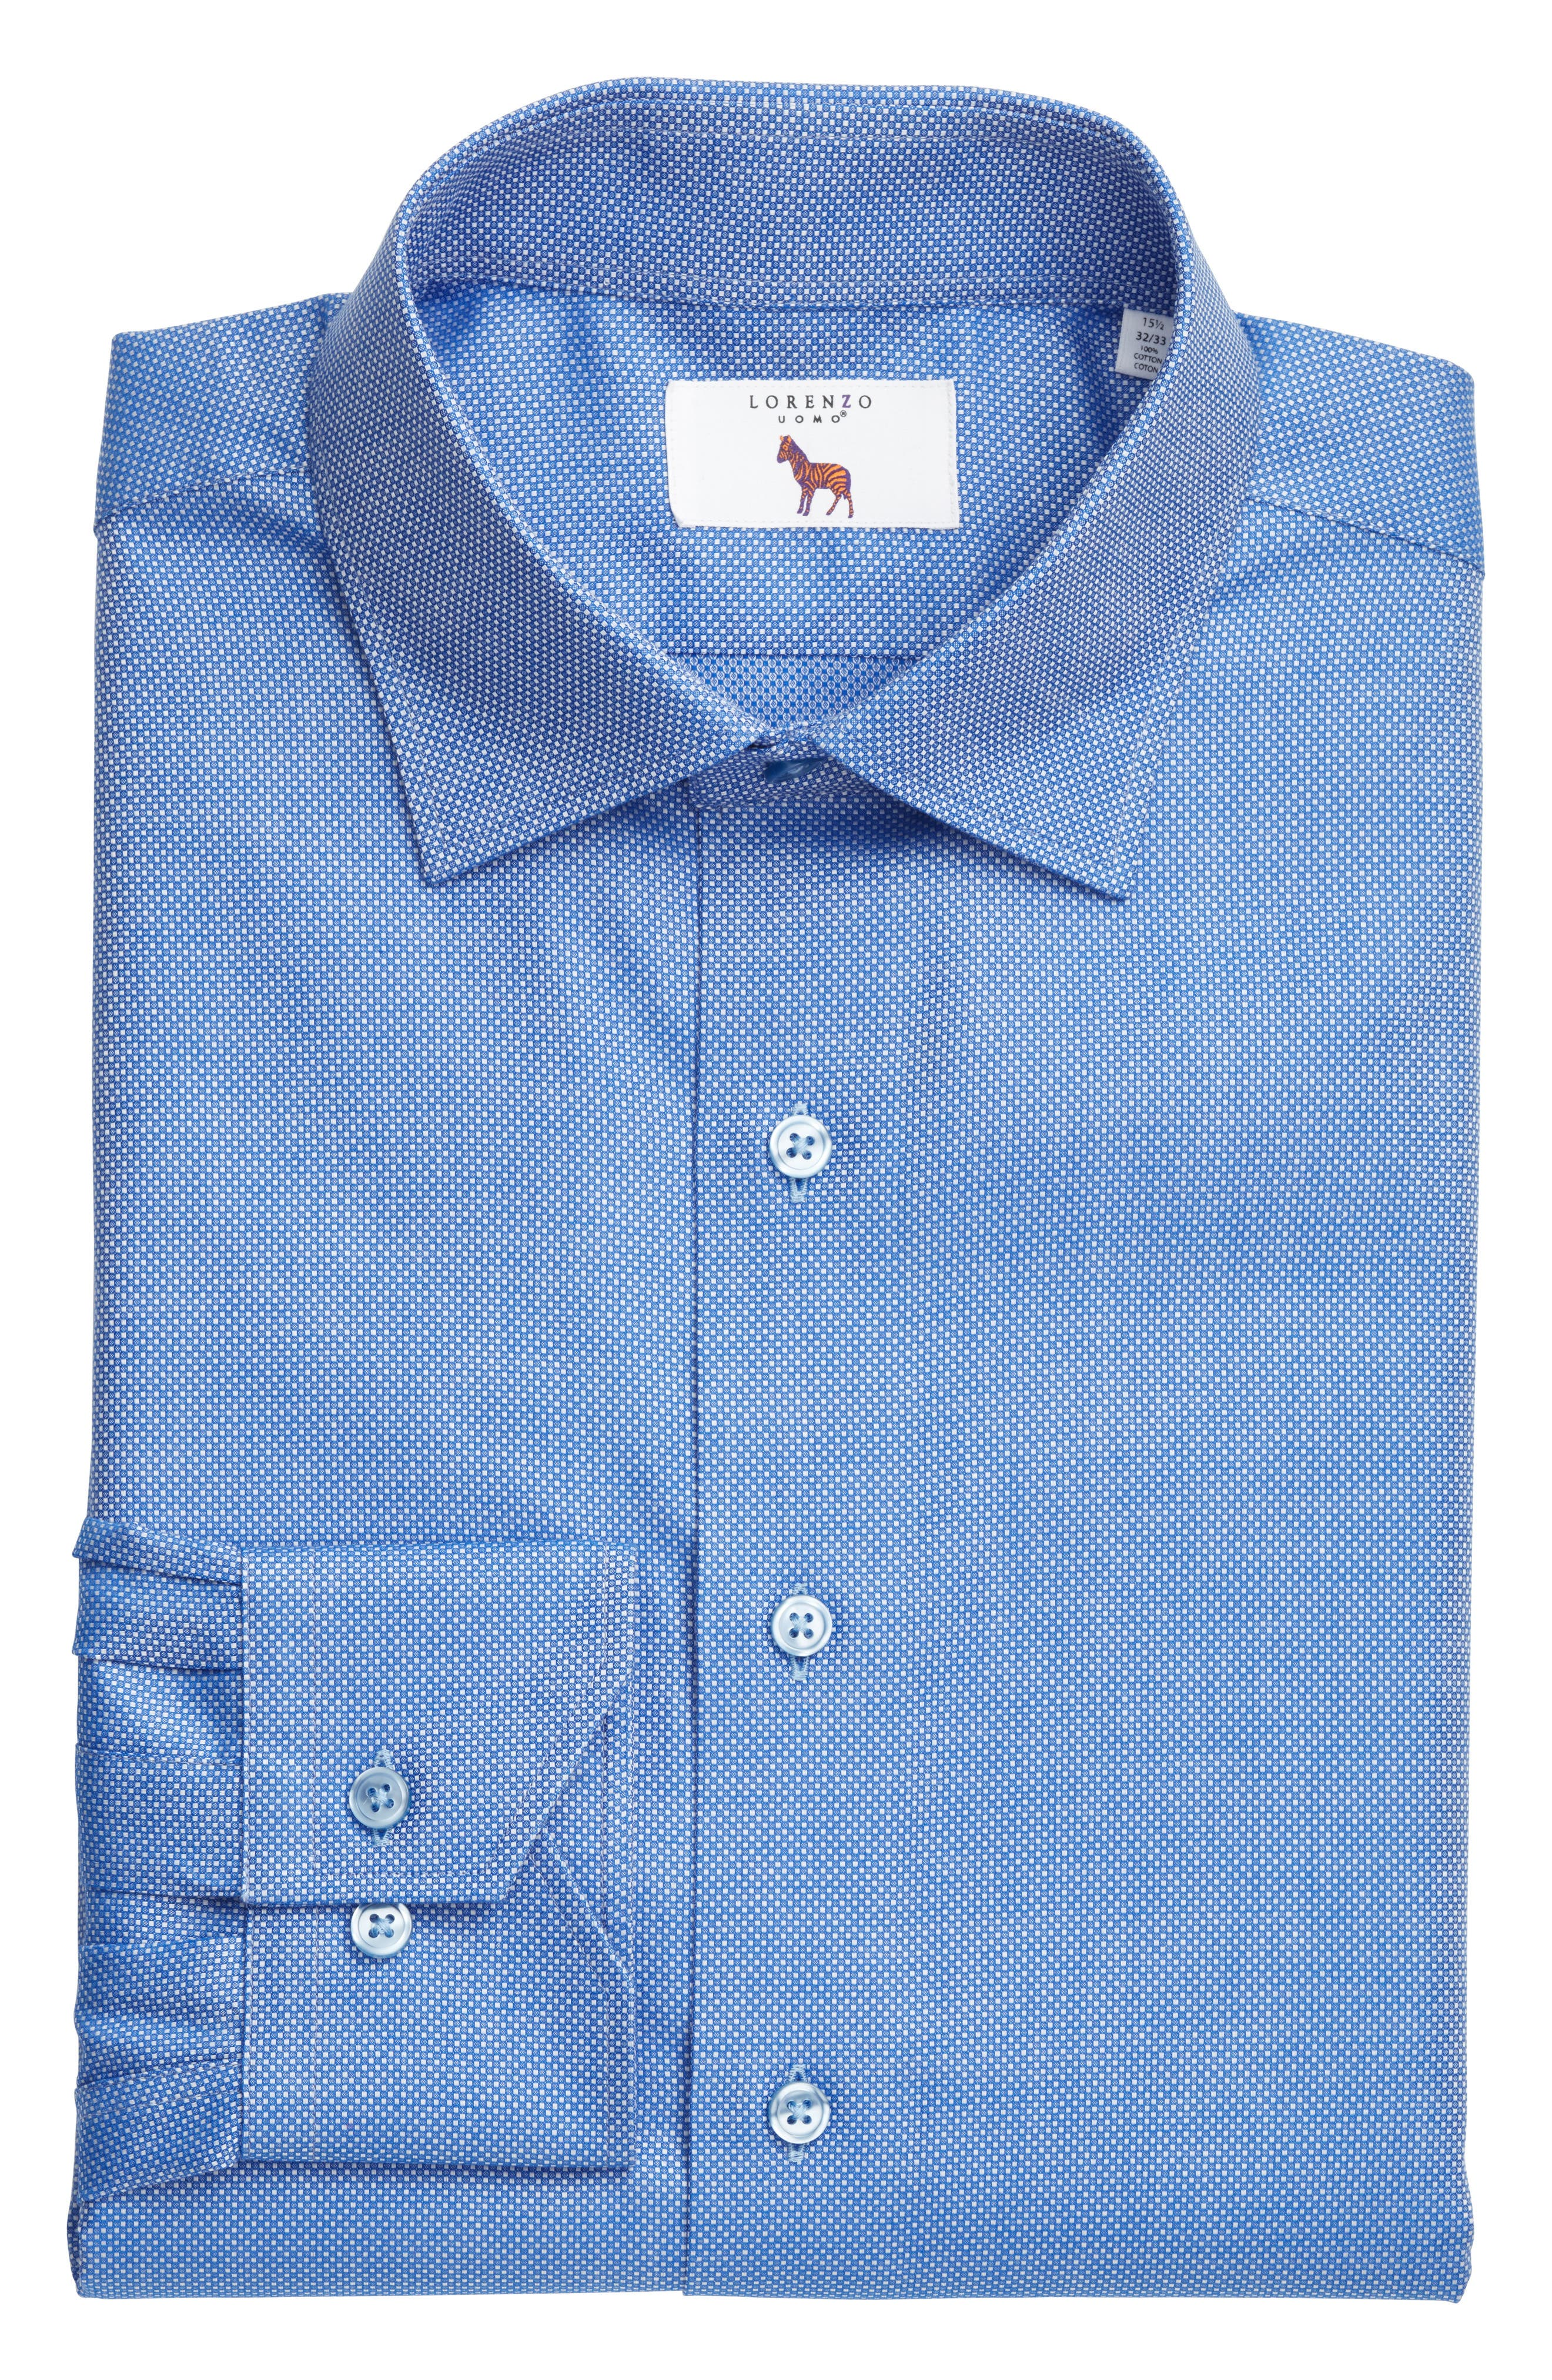 Lorenzo Uomo Trim Fit Textured Dress Shirt